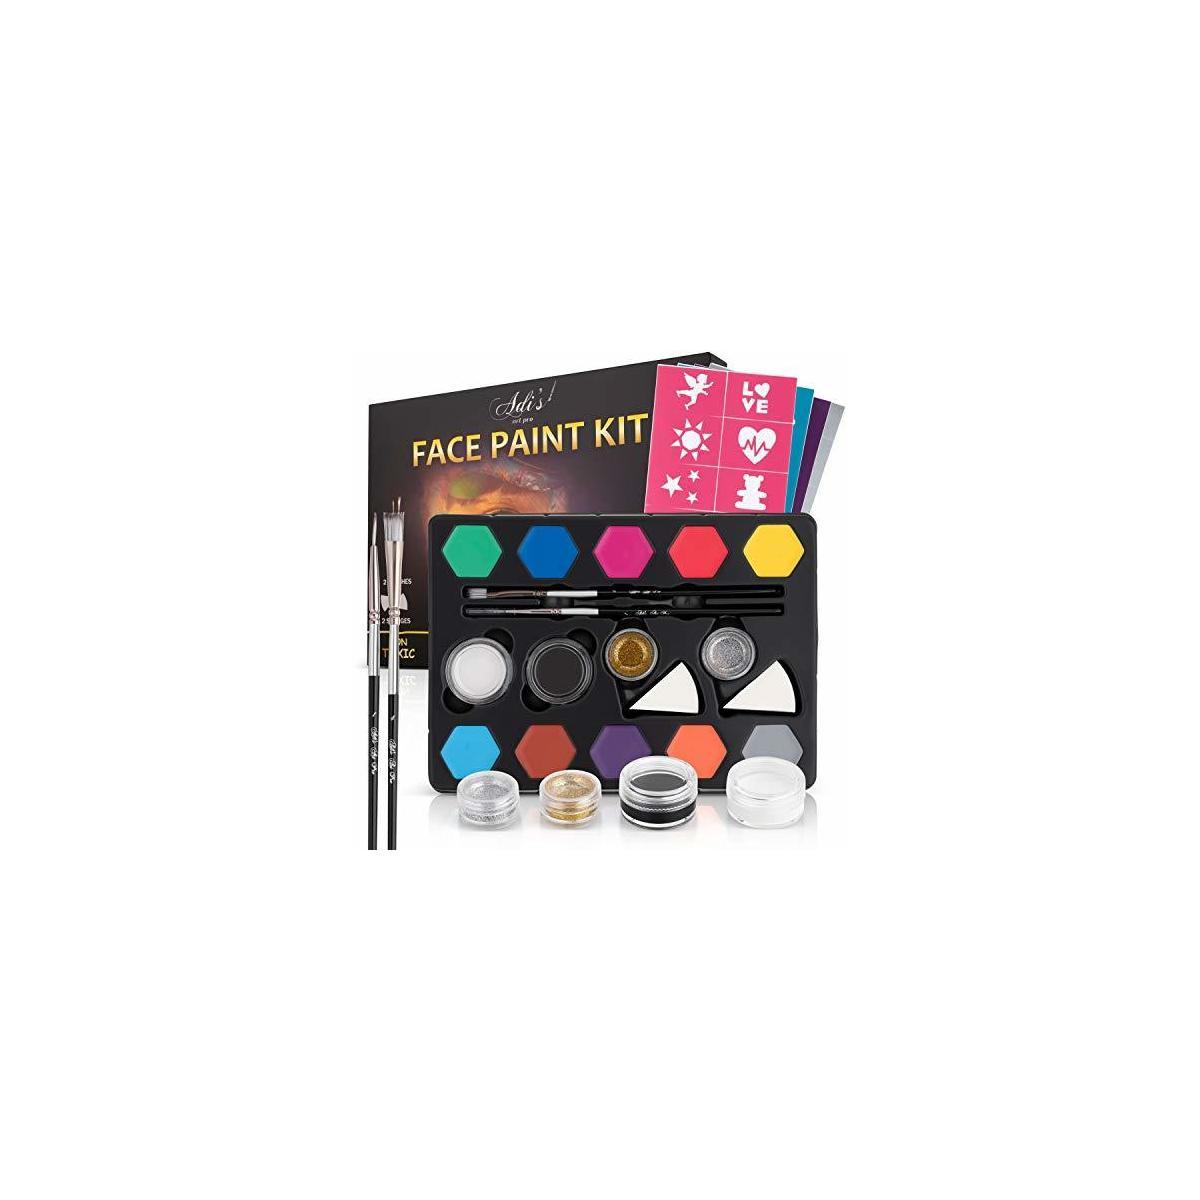 Face Paint Kit for Kids - 58 pcs.